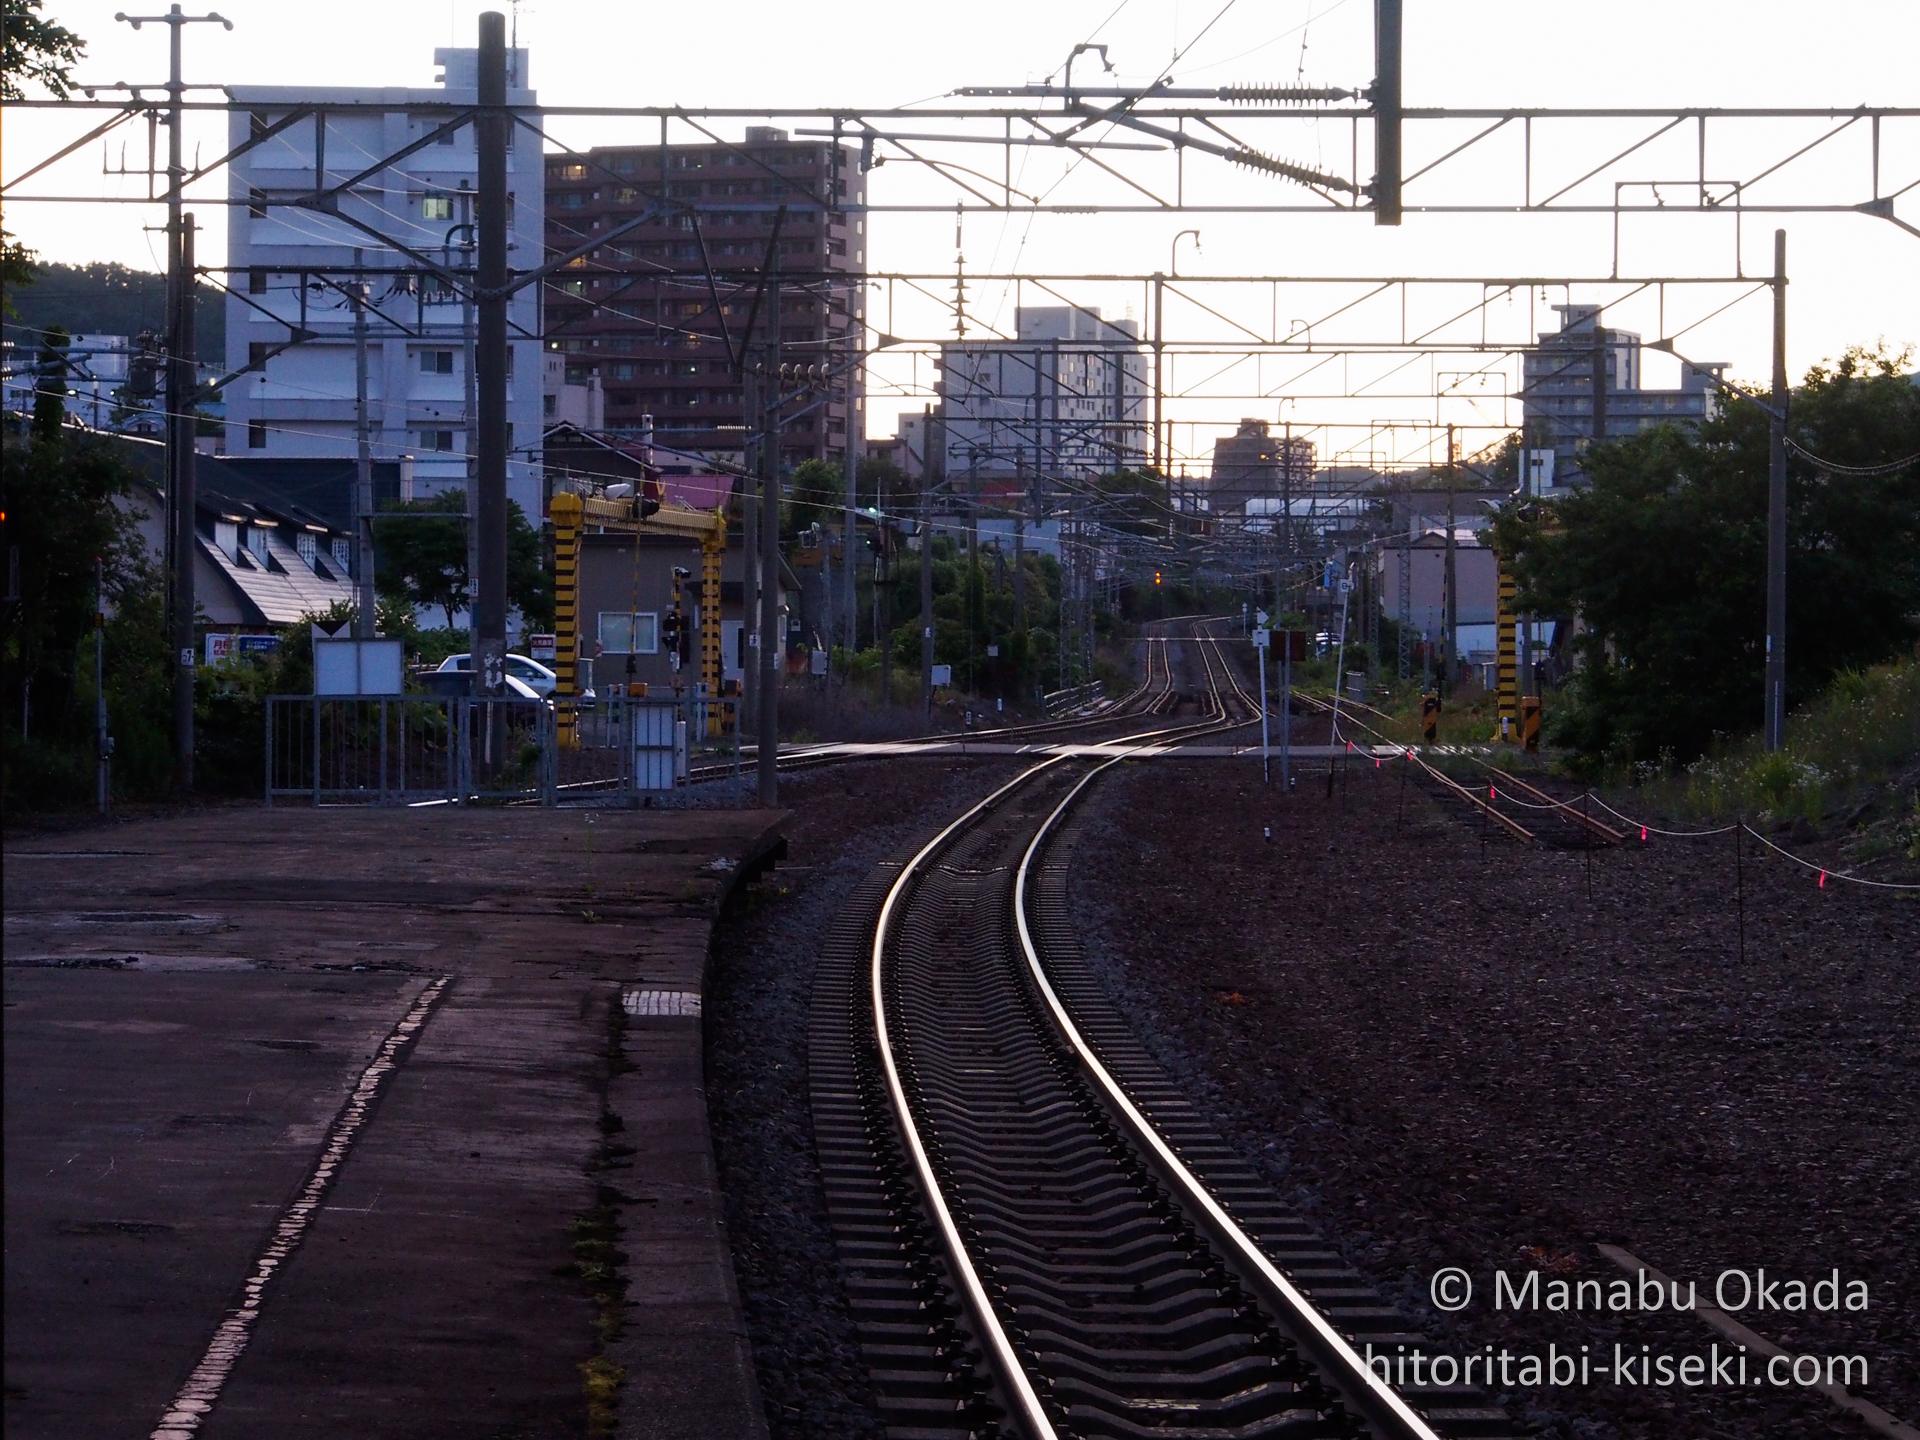 south-otaru-station-02.jpg